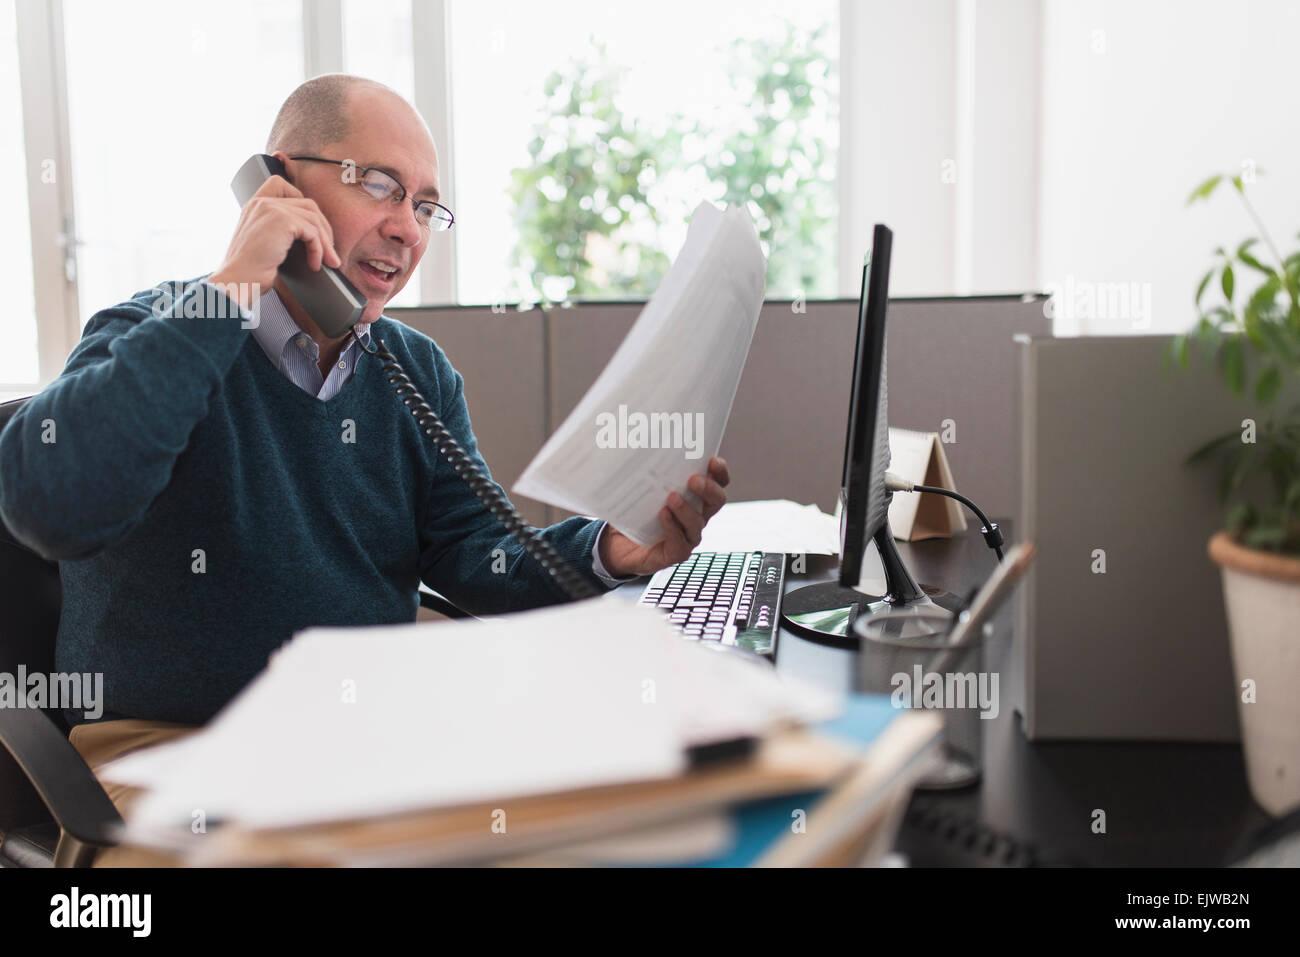 Mature businessman using landline phone in office - Stock Image